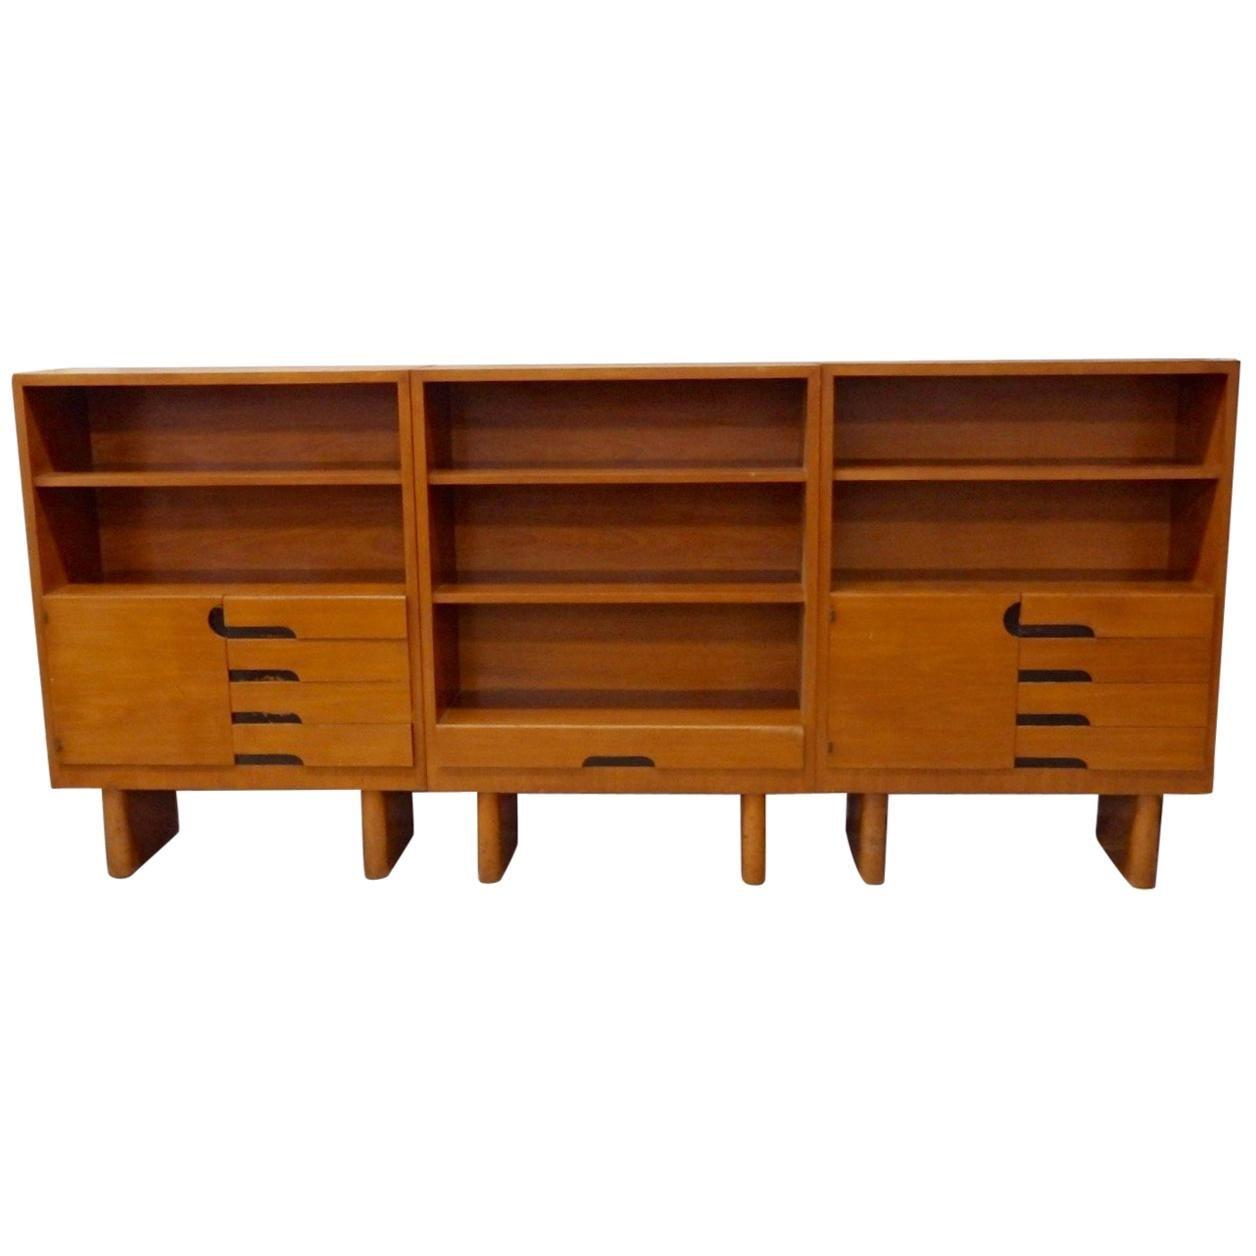 Rare Find Three Gilbert Rohde for Herman Miller Art Deco Bookshelf Units